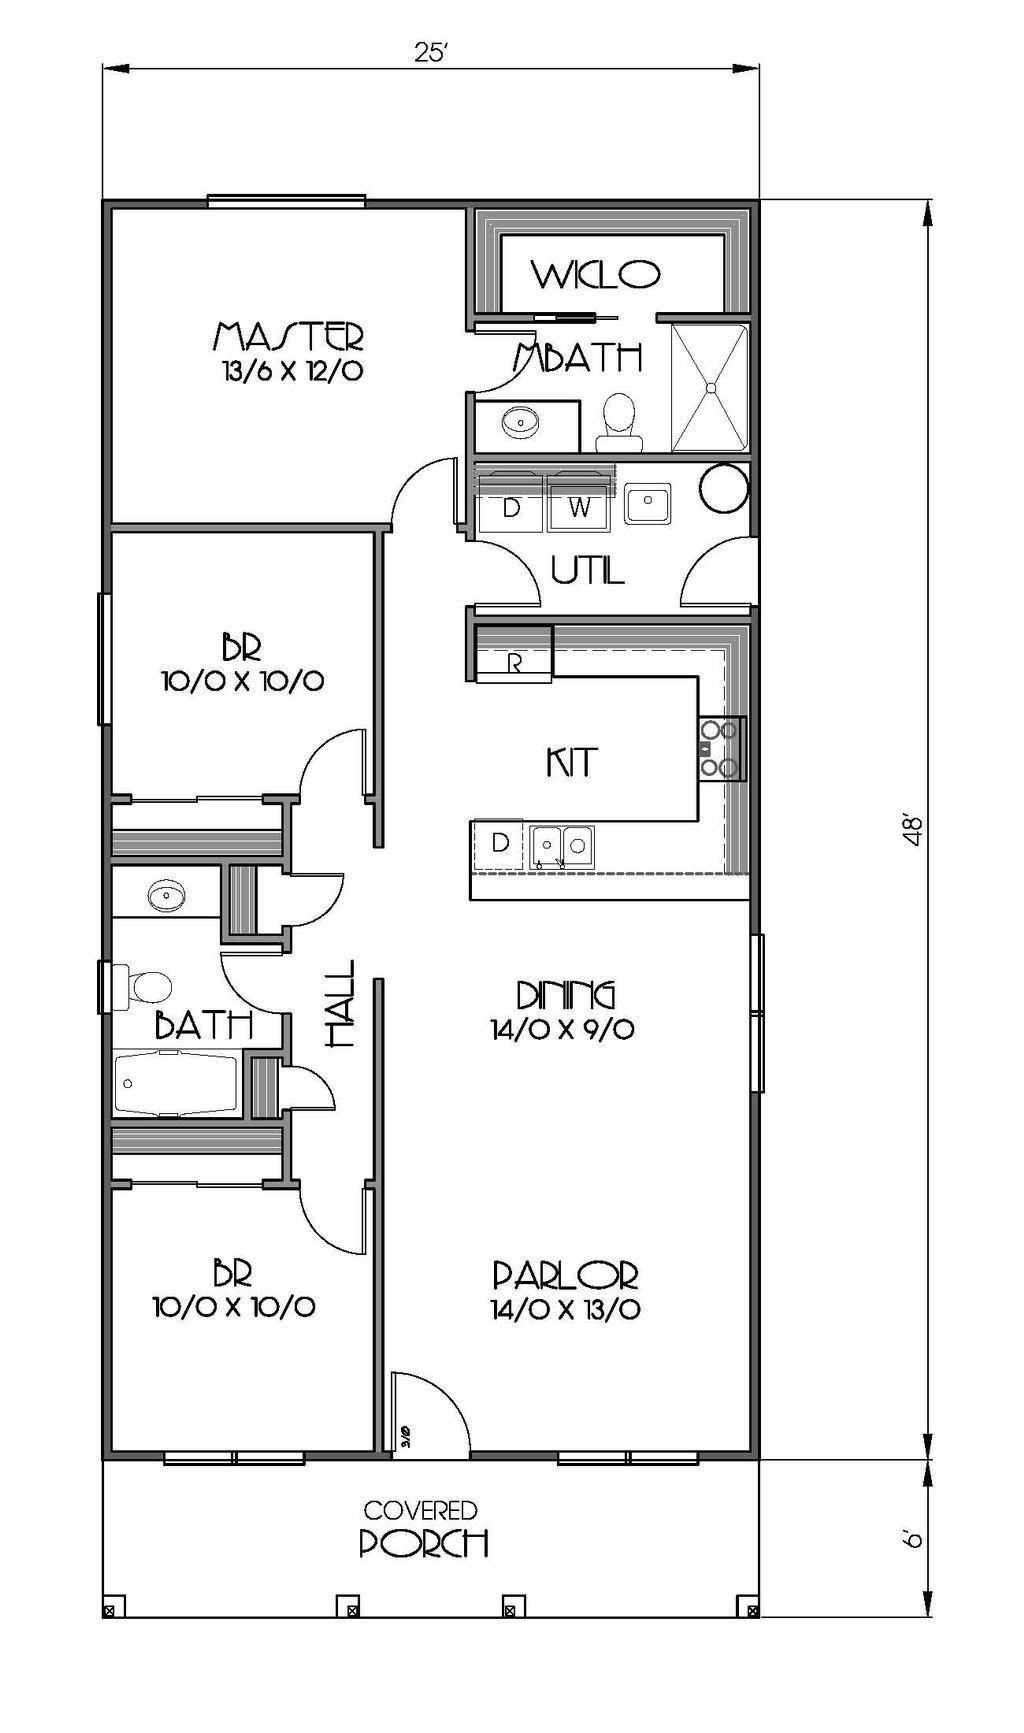 Cottage Style House Plan - 3 Beds 2 Baths 1200 Sq/Ft Plan #423-49 on rental house design, two bedroom house design, 4 bedrooms house design, kitchen house design, pool house design,